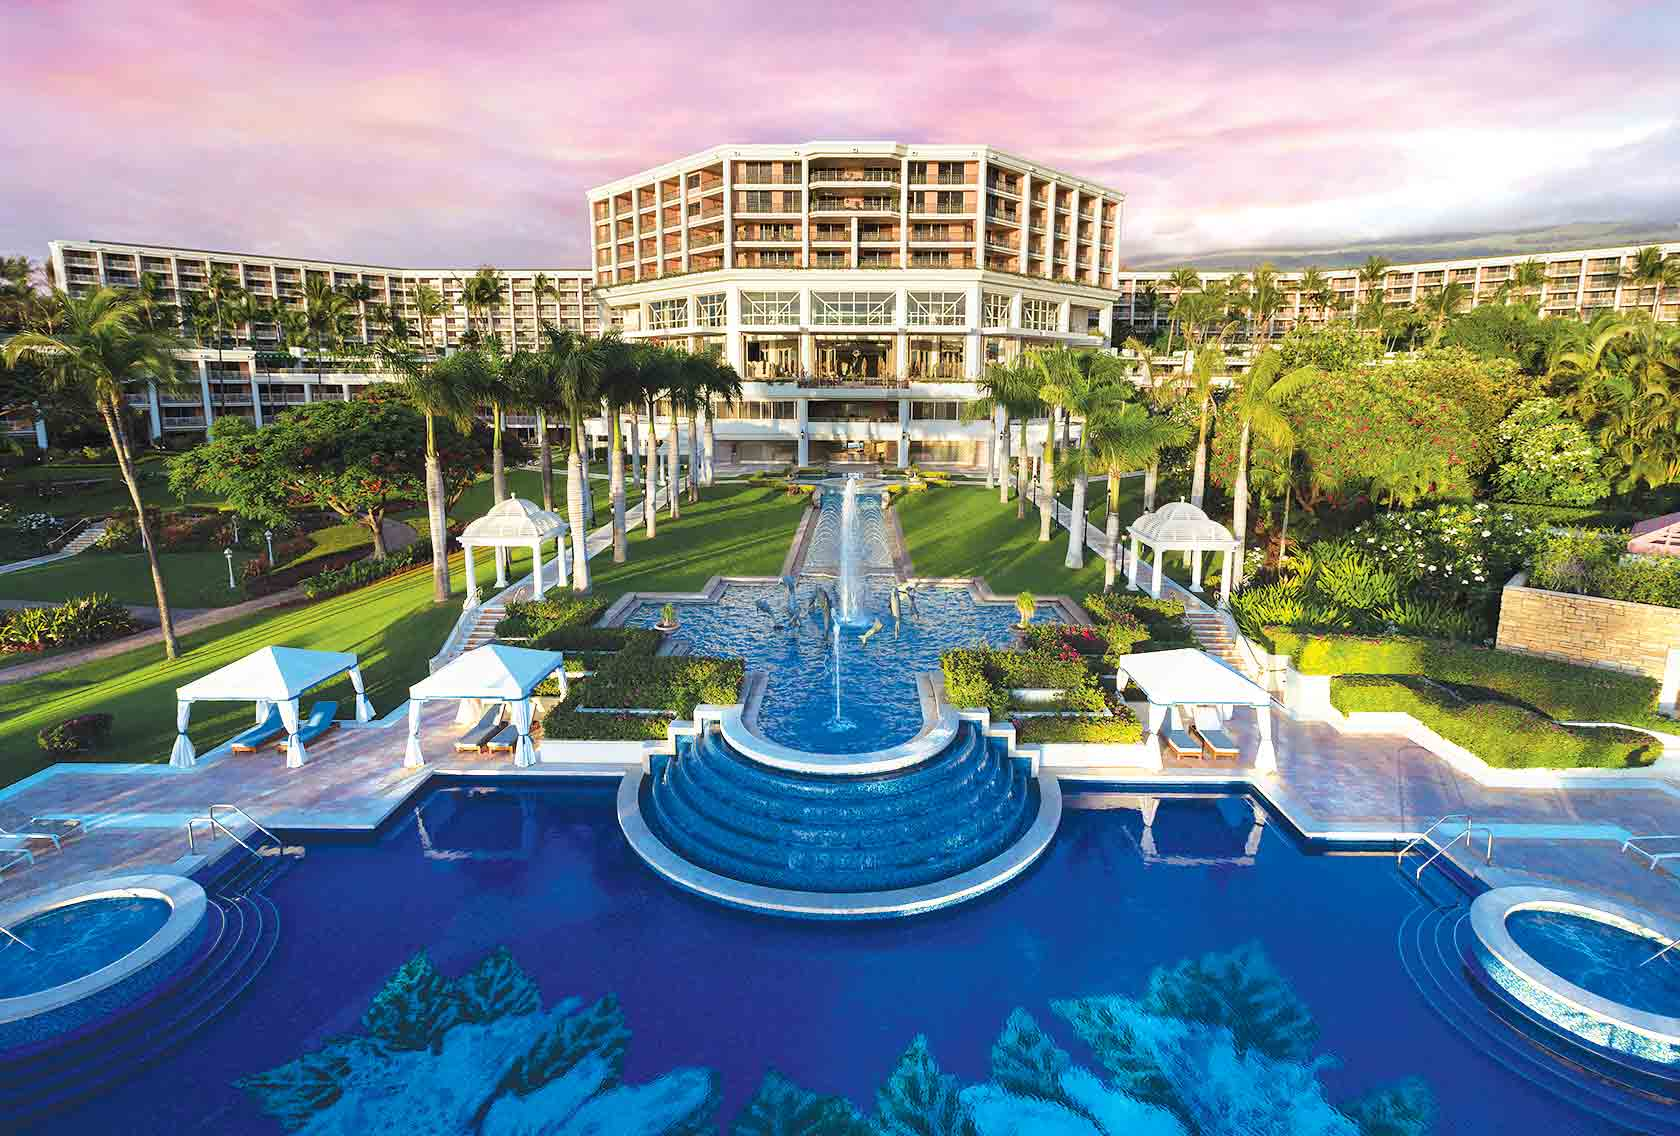 grand wailea insane hotel pool color view